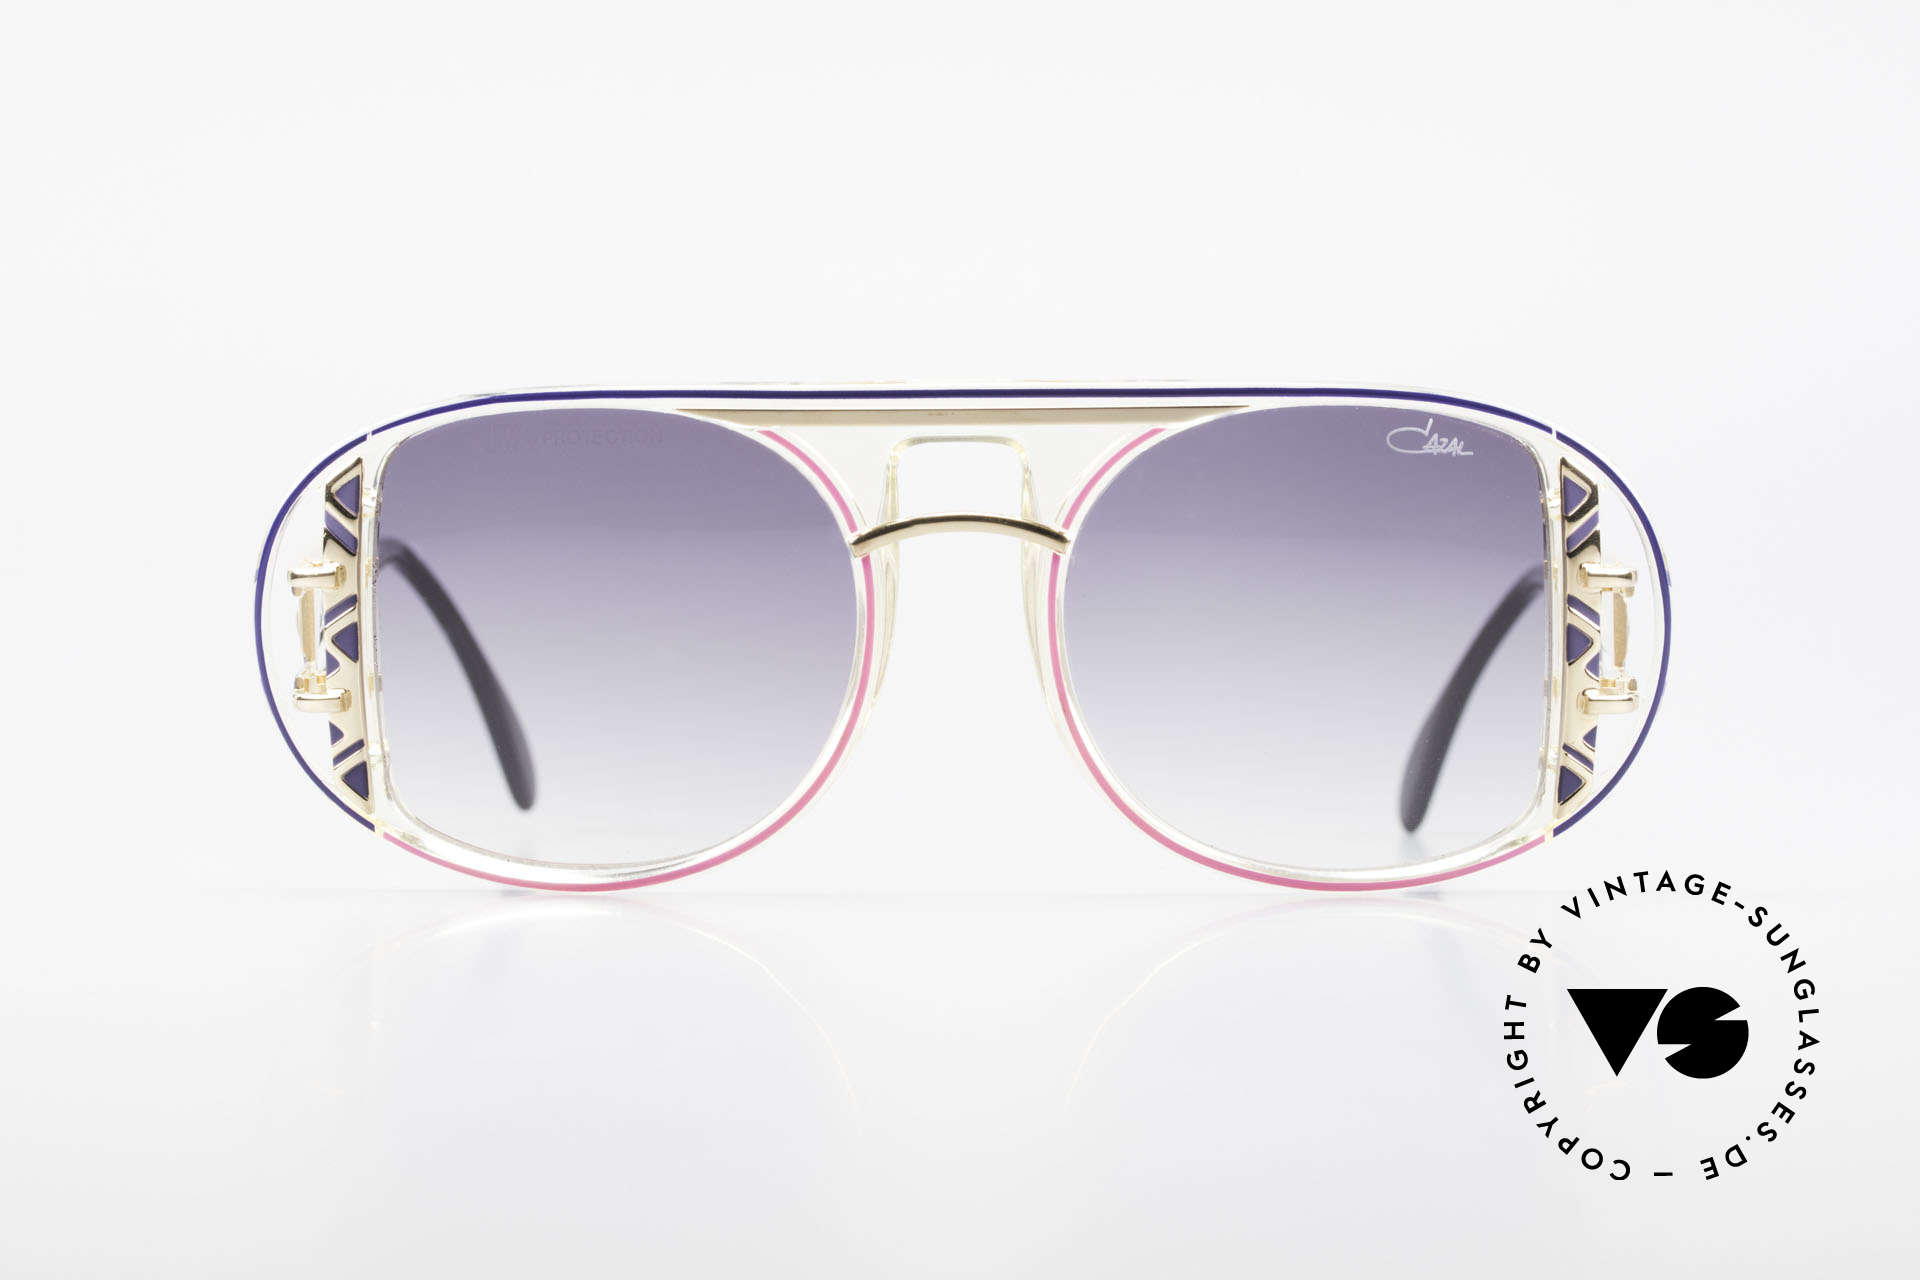 Cazal 875 Rare 90's Designer Sunglasses, spectacular Cazal designer shades from 1992/93, Made for Men and Women